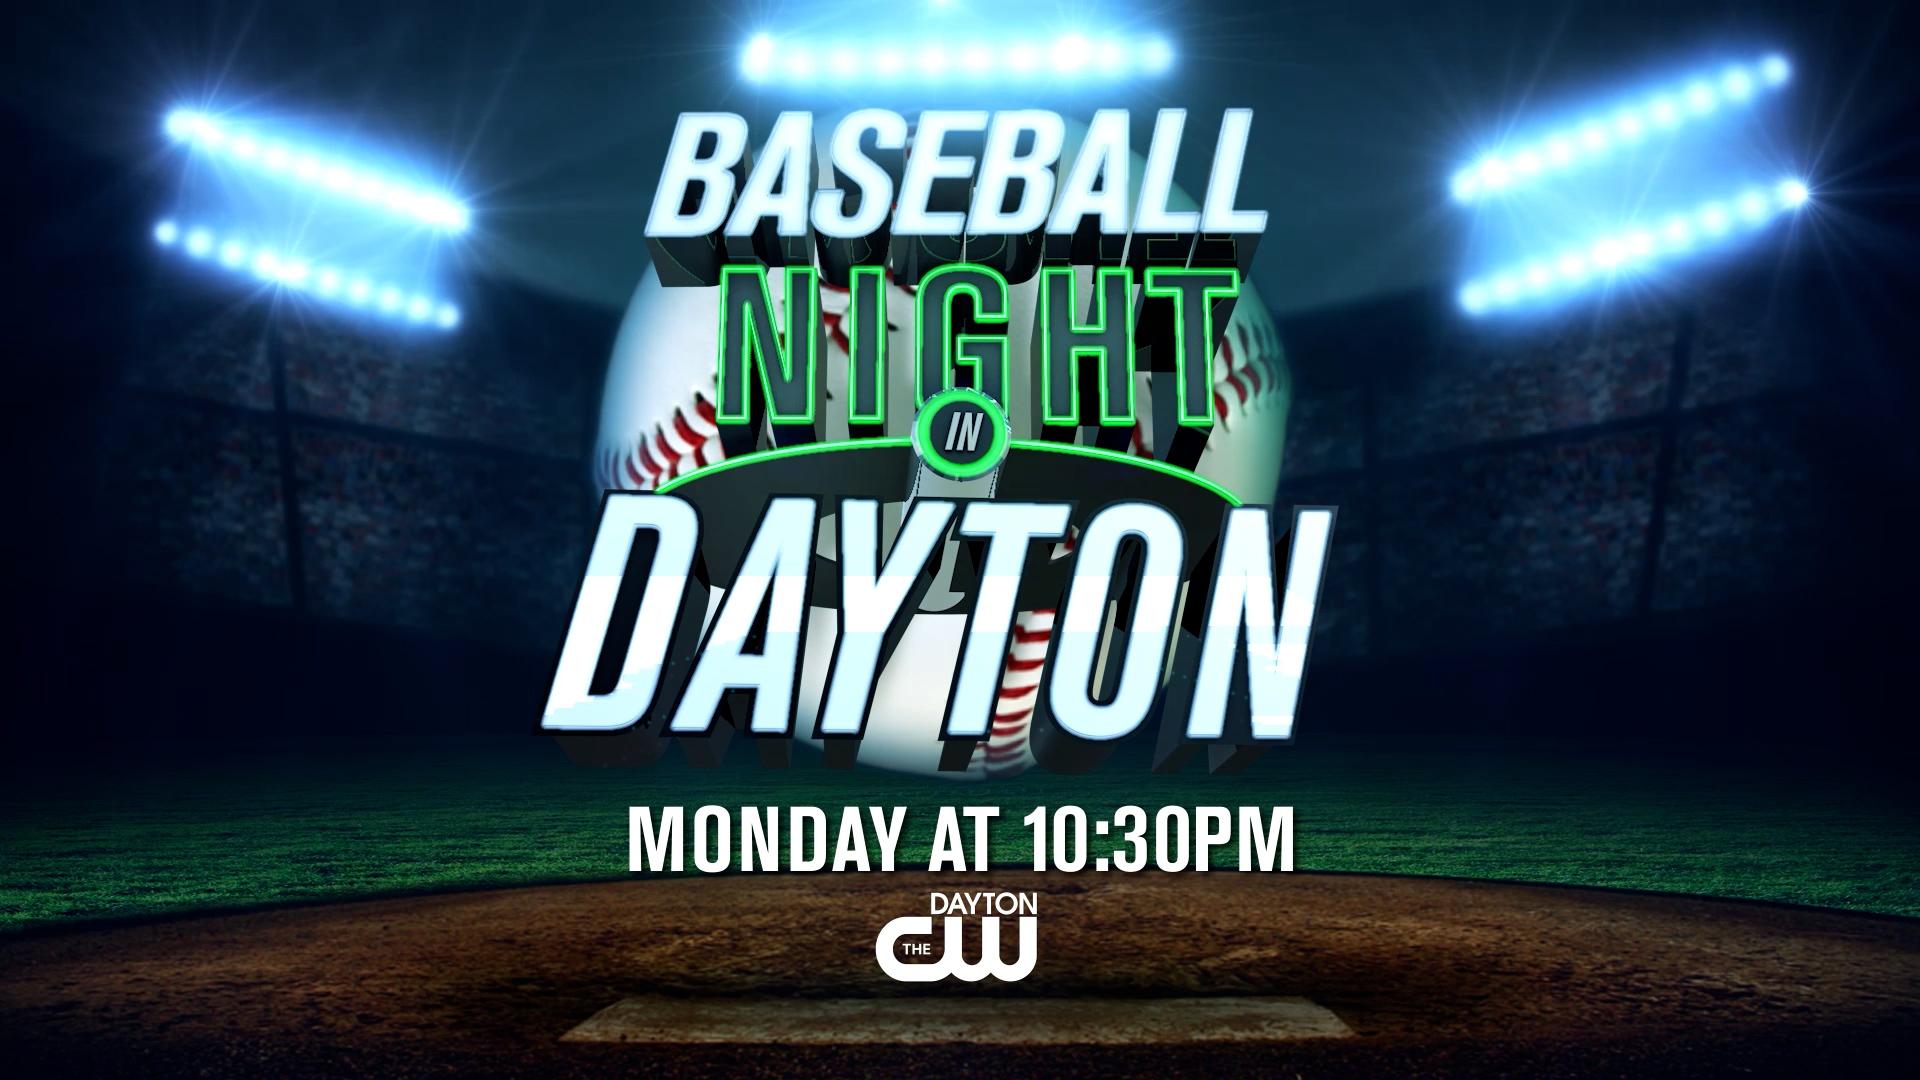 Baseball Night in Dayton